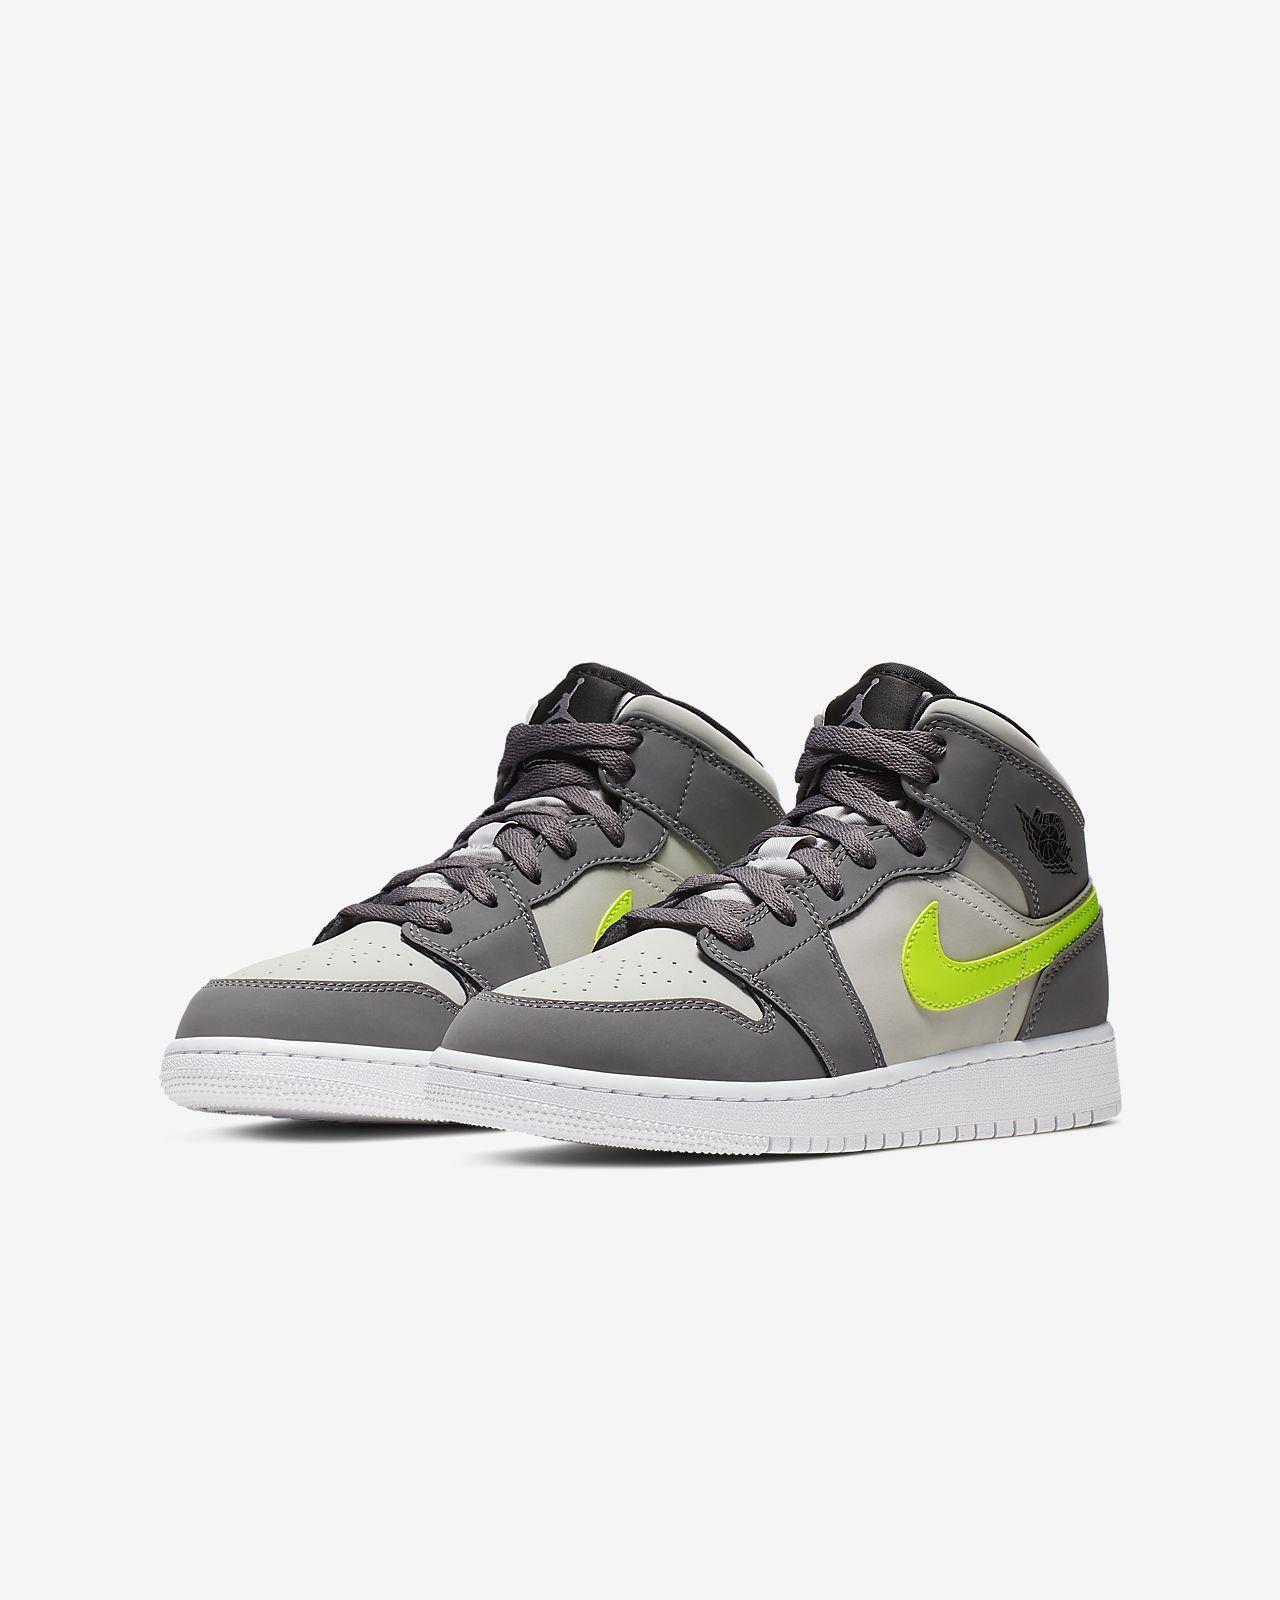 low priced 01519 dd689 Air Jordan 1 Mid Big Kids' Shoe